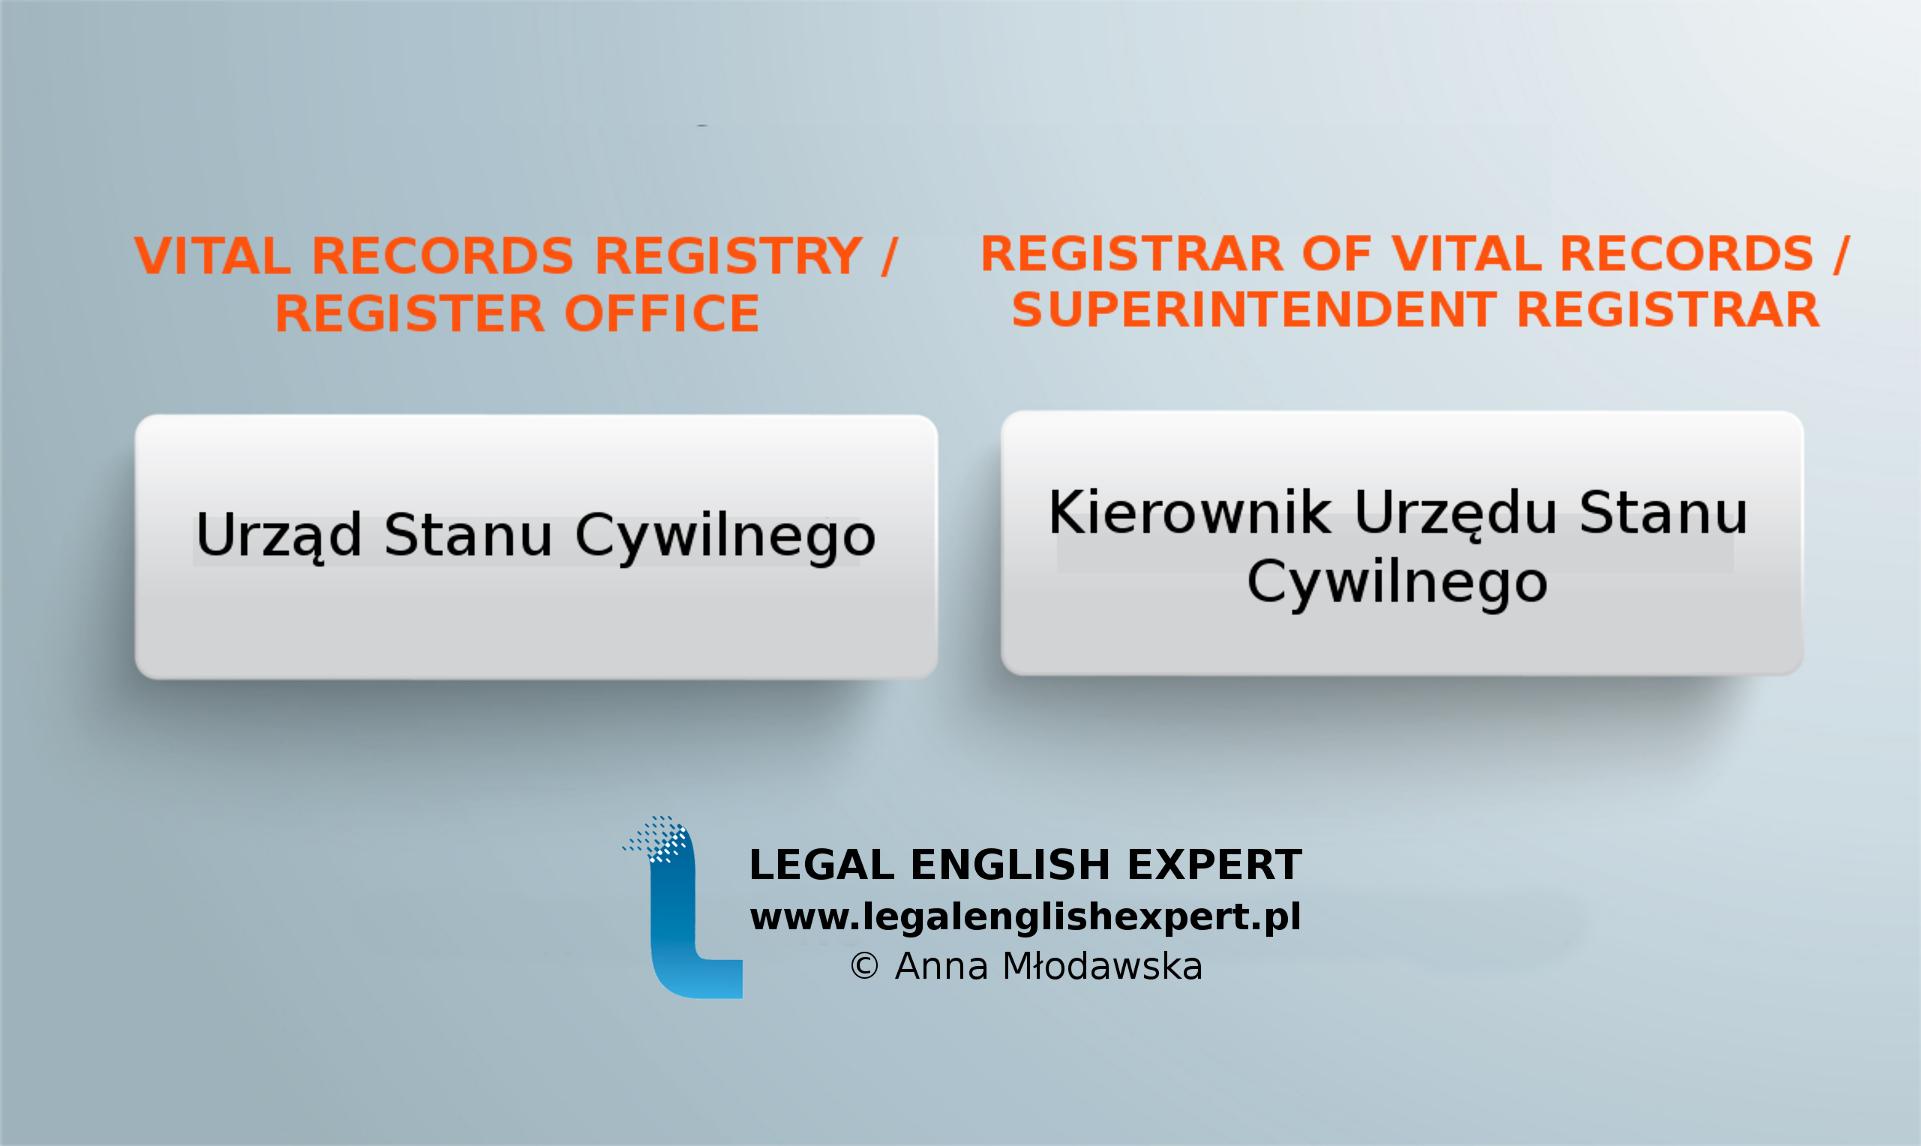 LEGAL ENGLISH EXPERT - infografika_56 - urząd stanu cywilnego